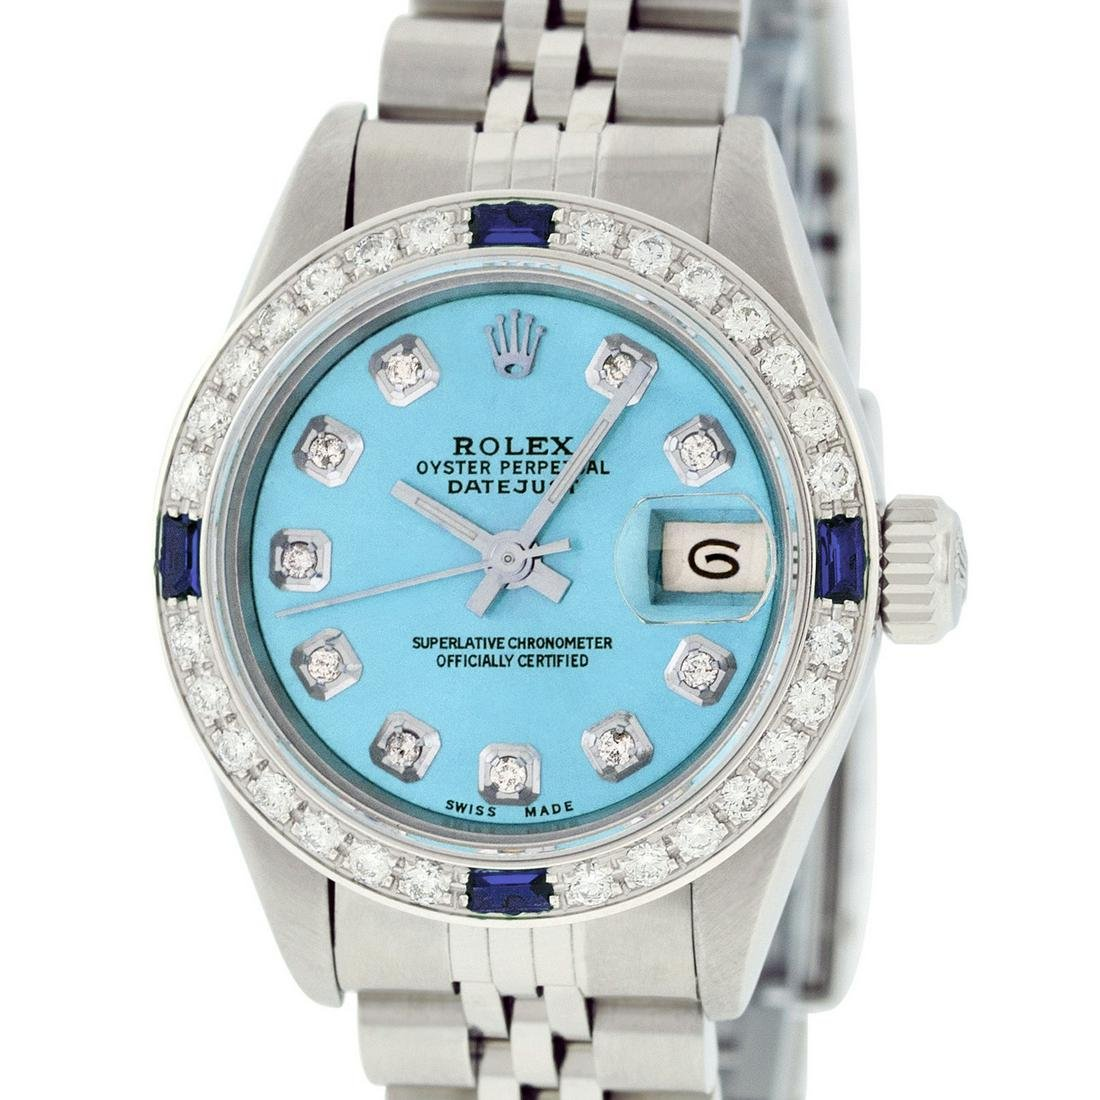 Rolex Ladies Datejust Watch SS & 18K White Gold Sky